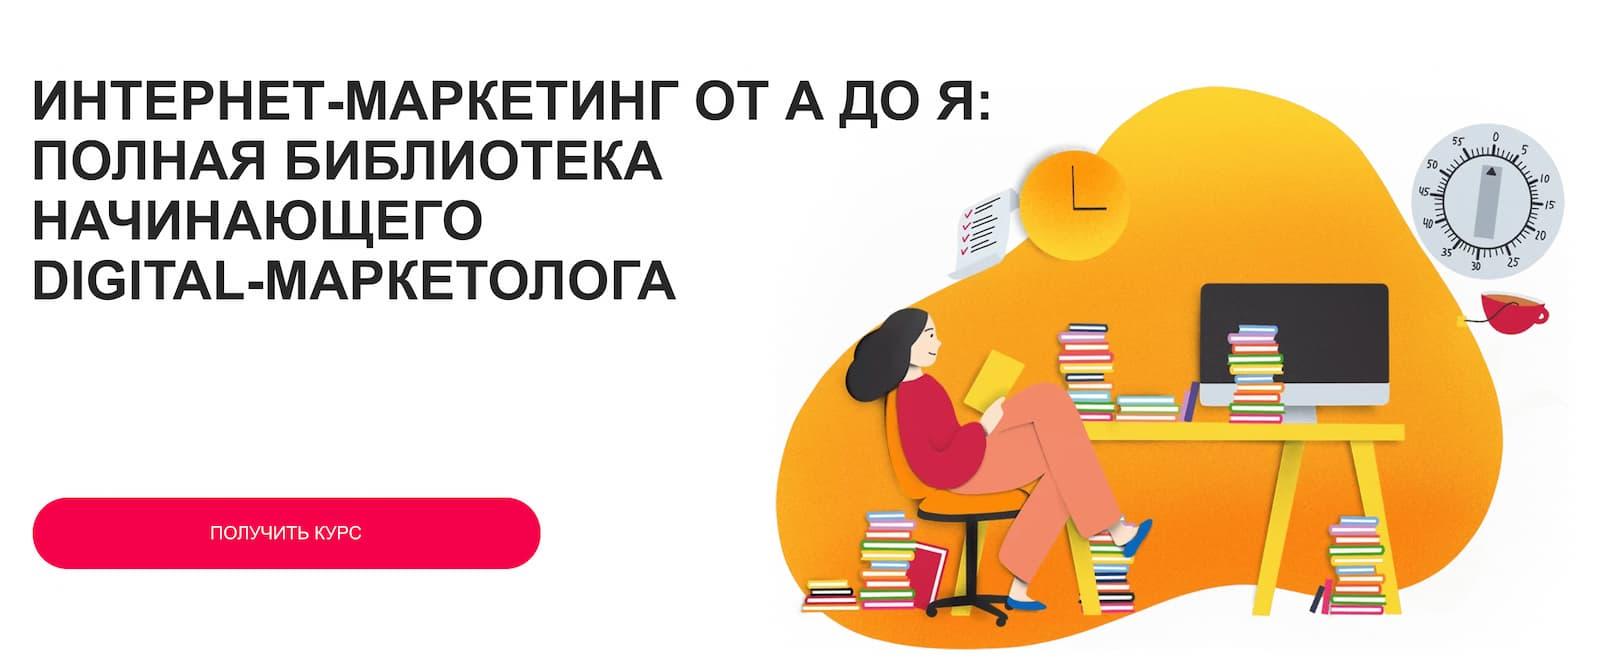 Записаться на курс «Интернет-маркетинг от А до Я: Полная библиотека начинающего digital-маркетолога» от MaEd